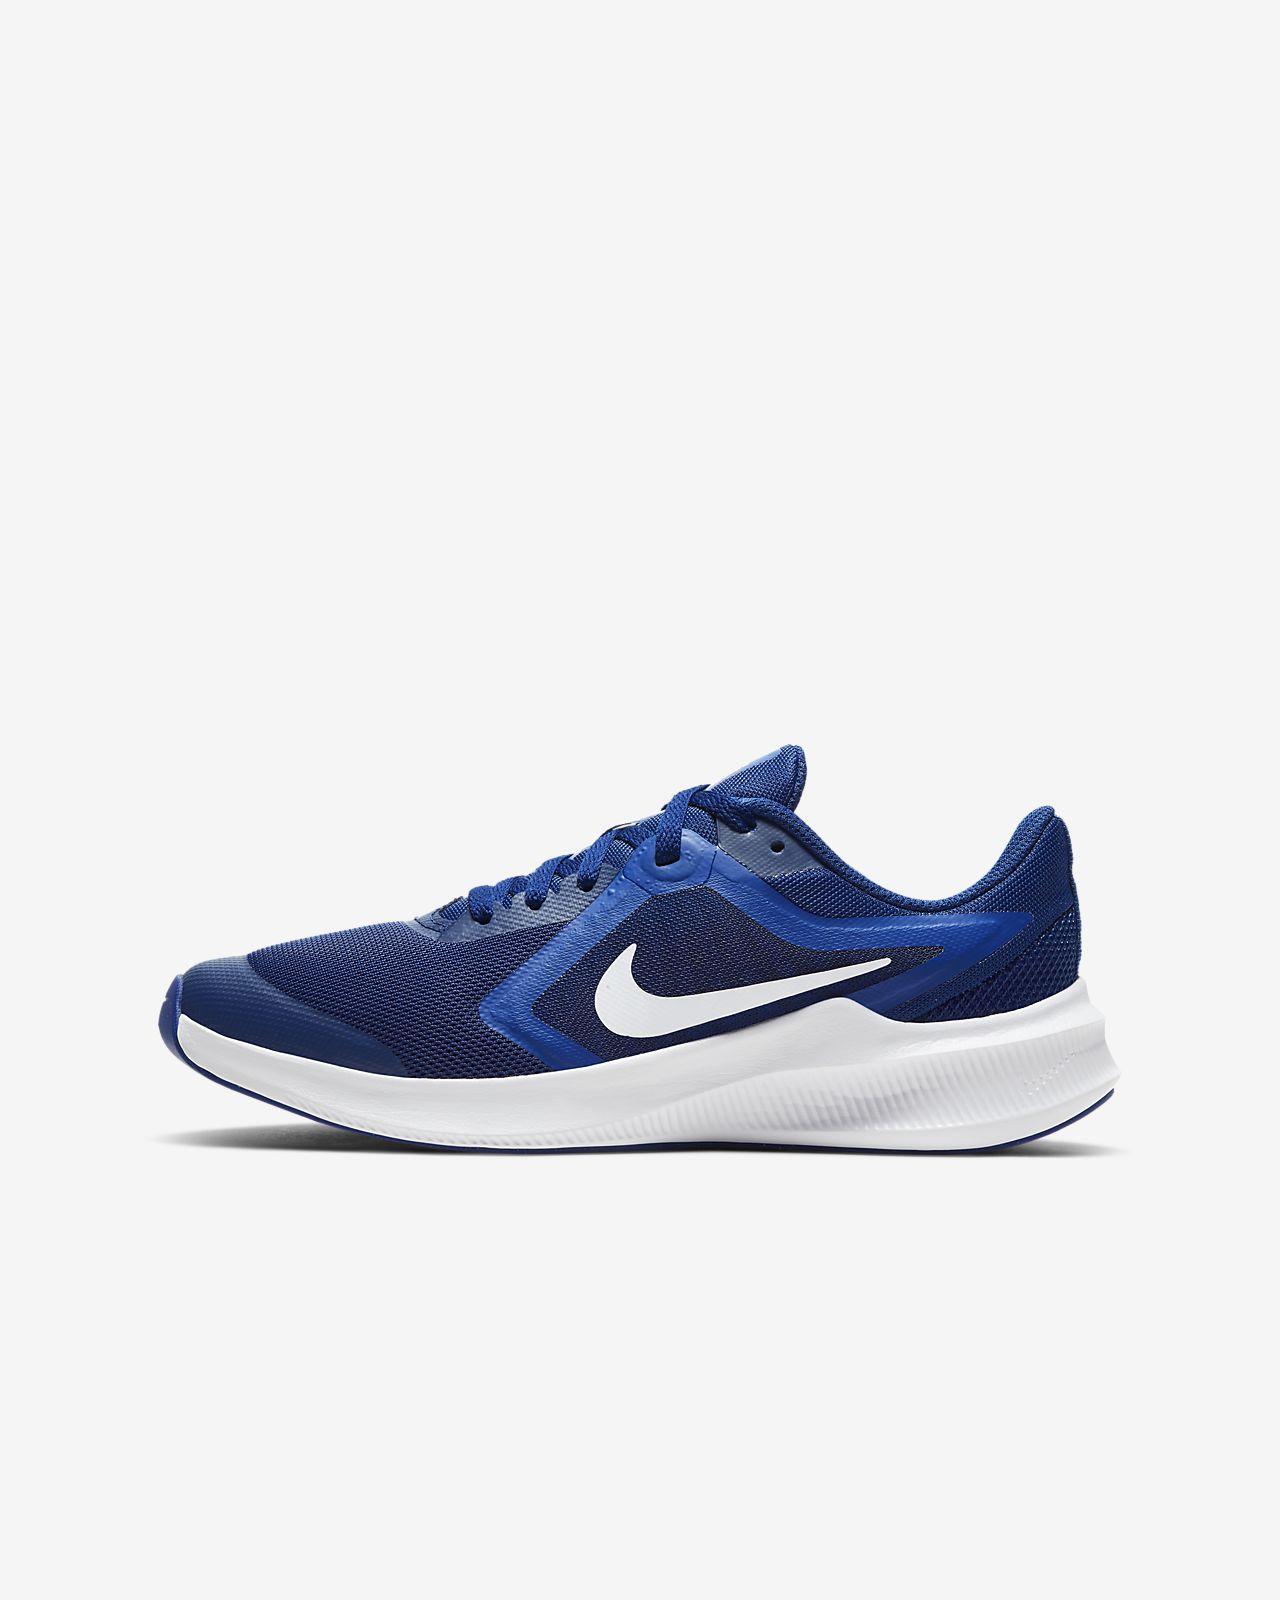 Nike Downshifter 10 Older Kids' Running Shoe